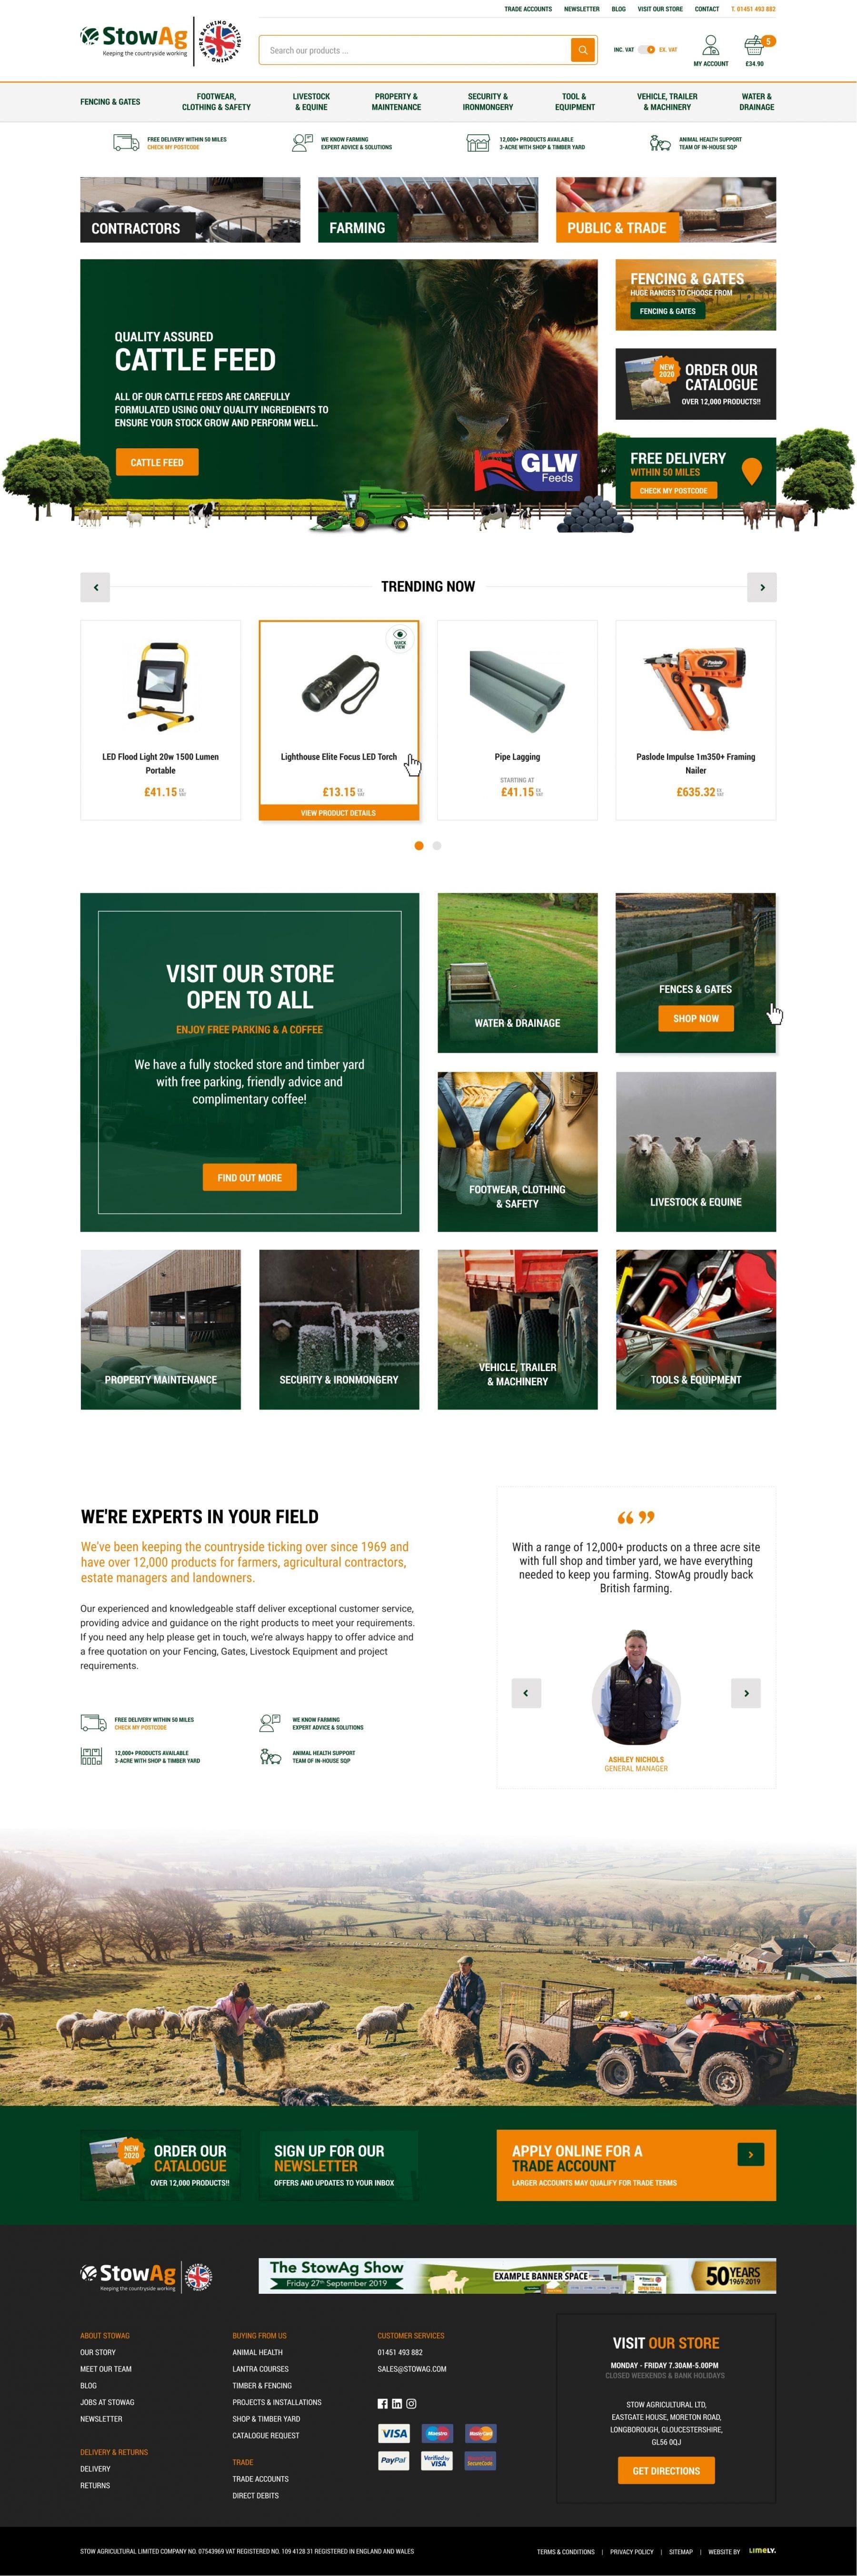 StowAg Homepage